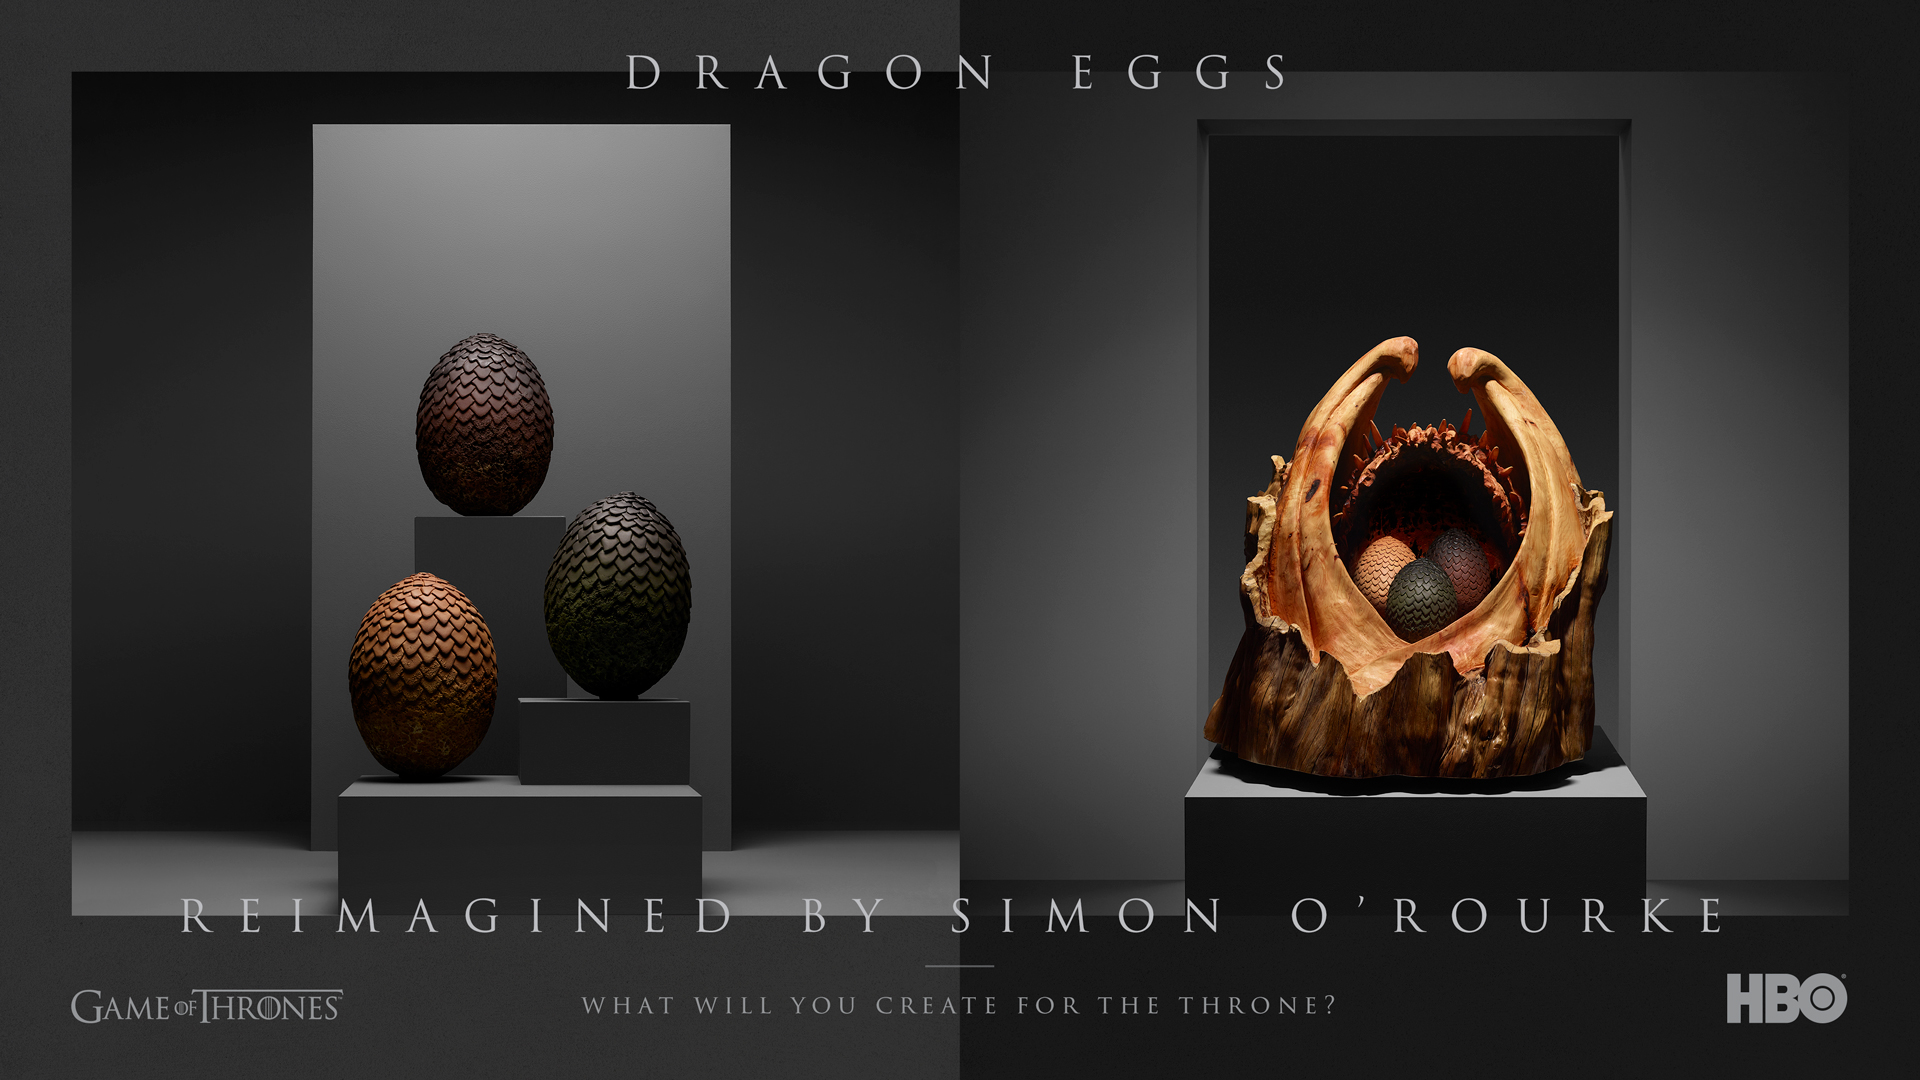 09_FIRE_Dragon_Eggs_Simon_O_Rourke.jpg